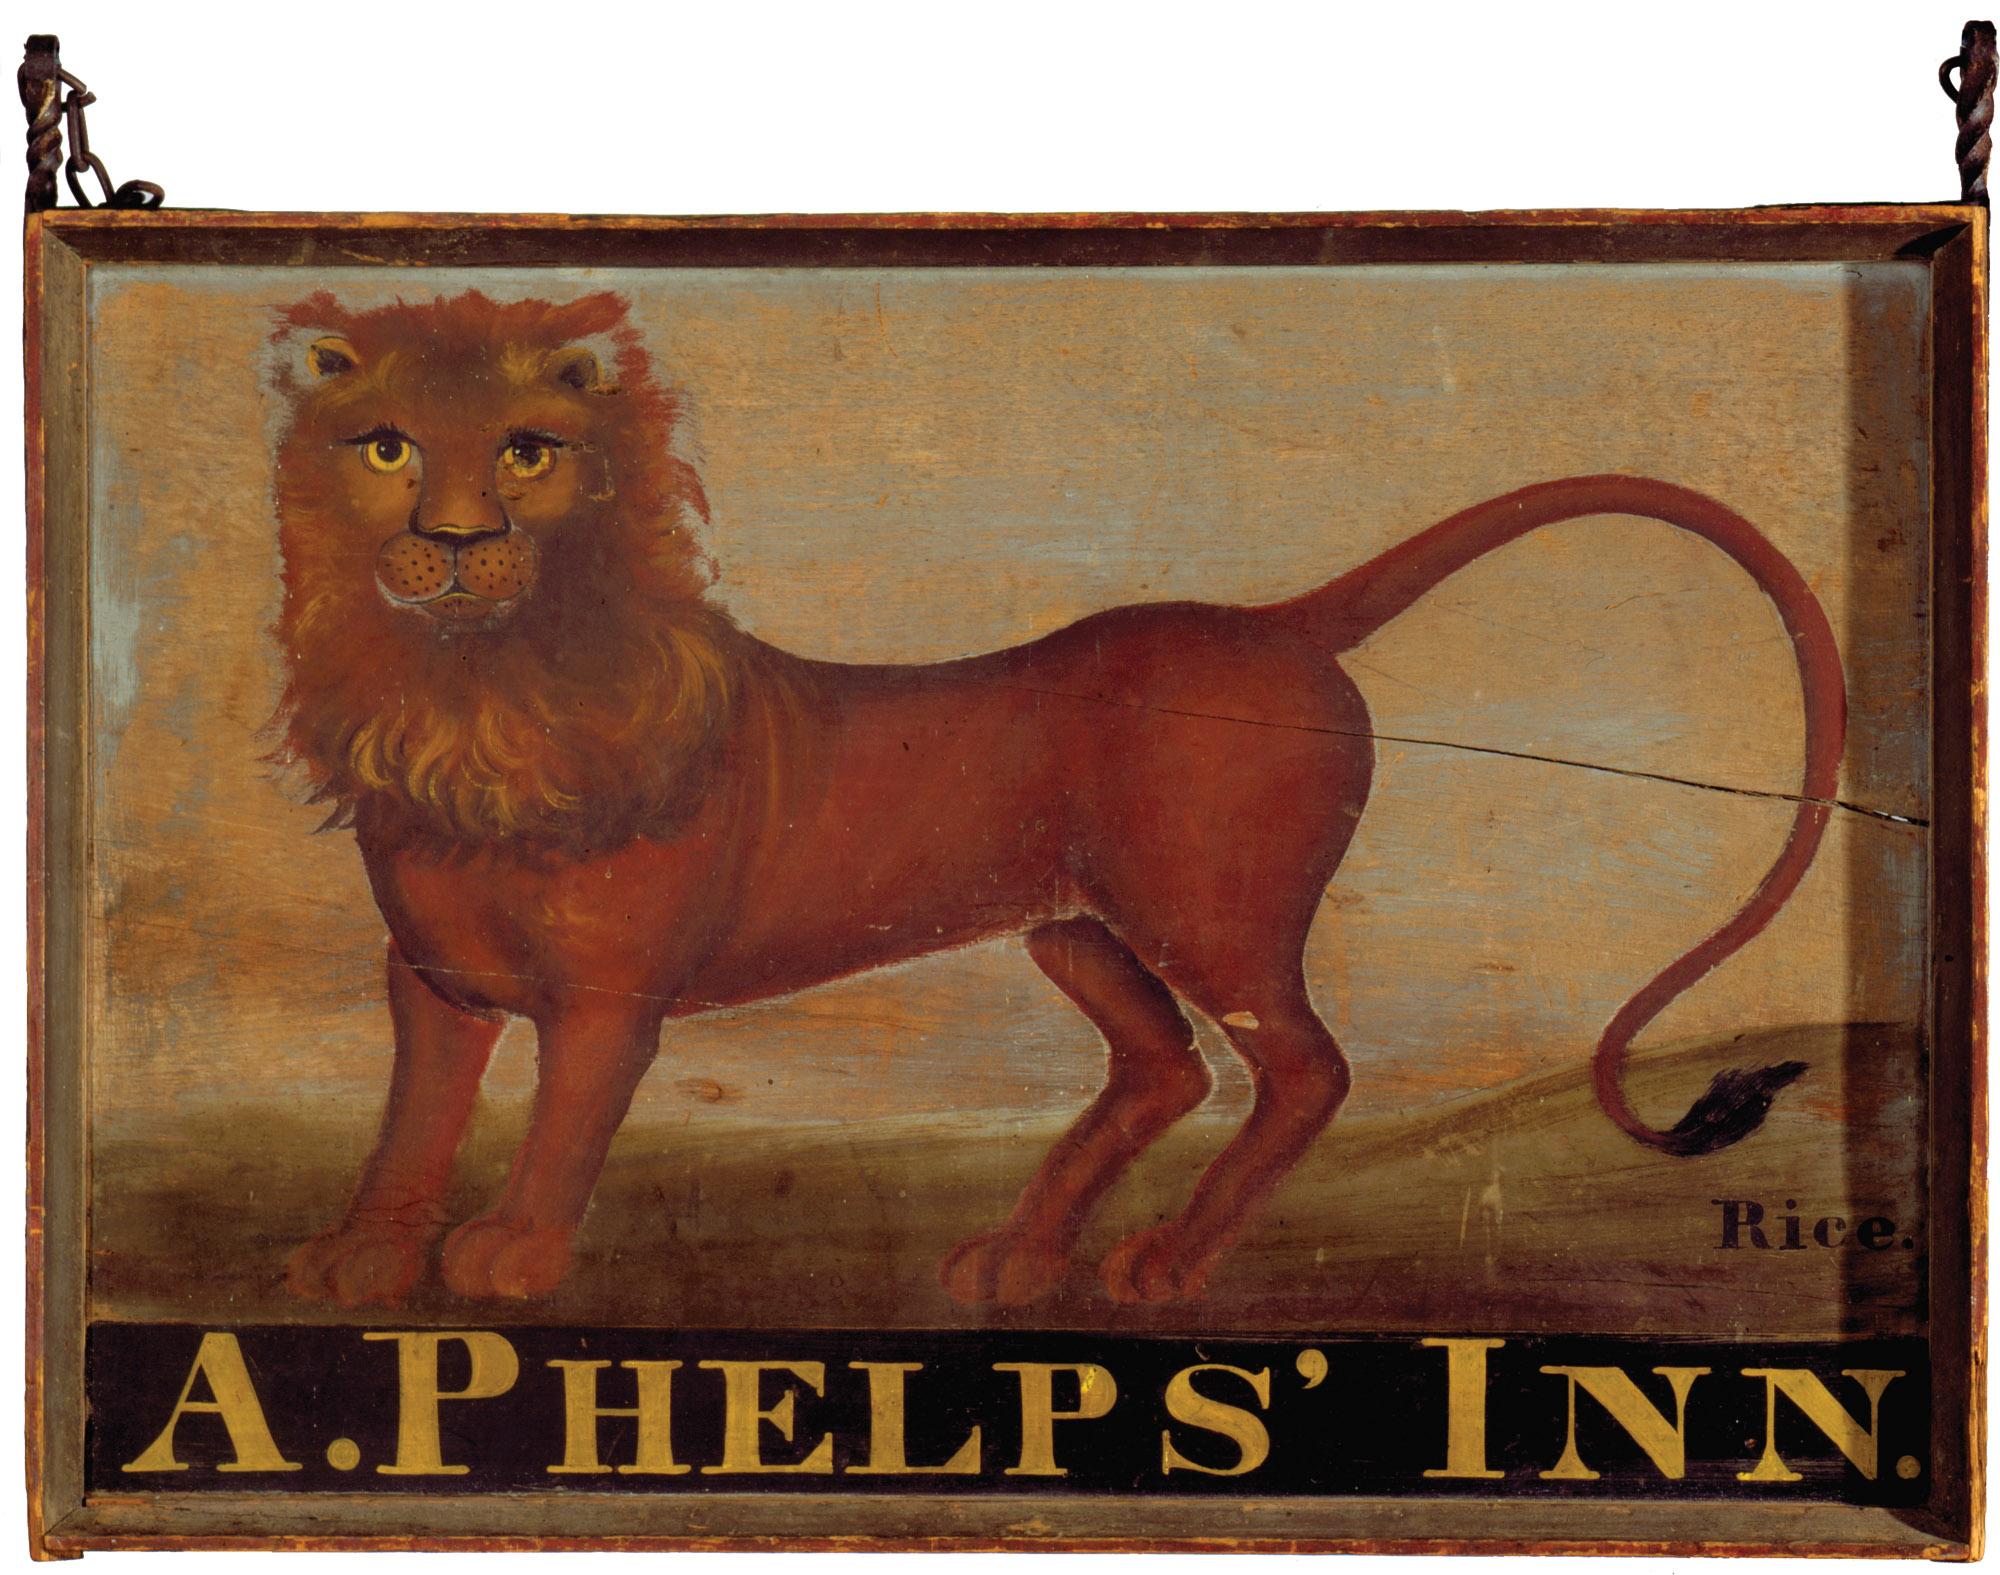 The Arah Phelps Inn sign